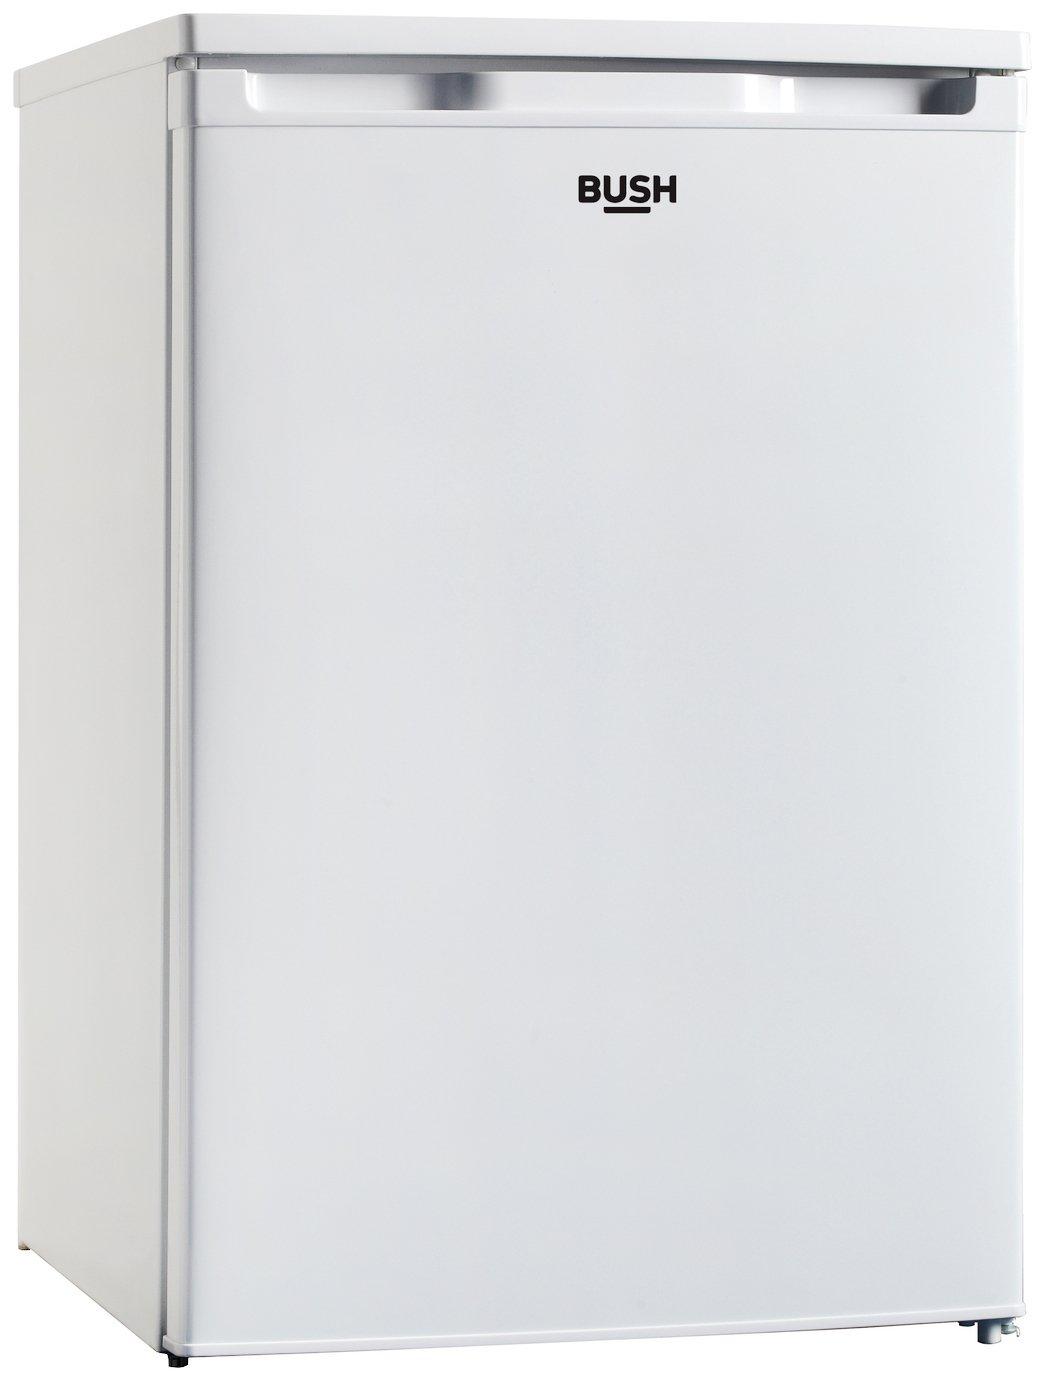 Bush M5585UCFR Under Counter Freezer - White